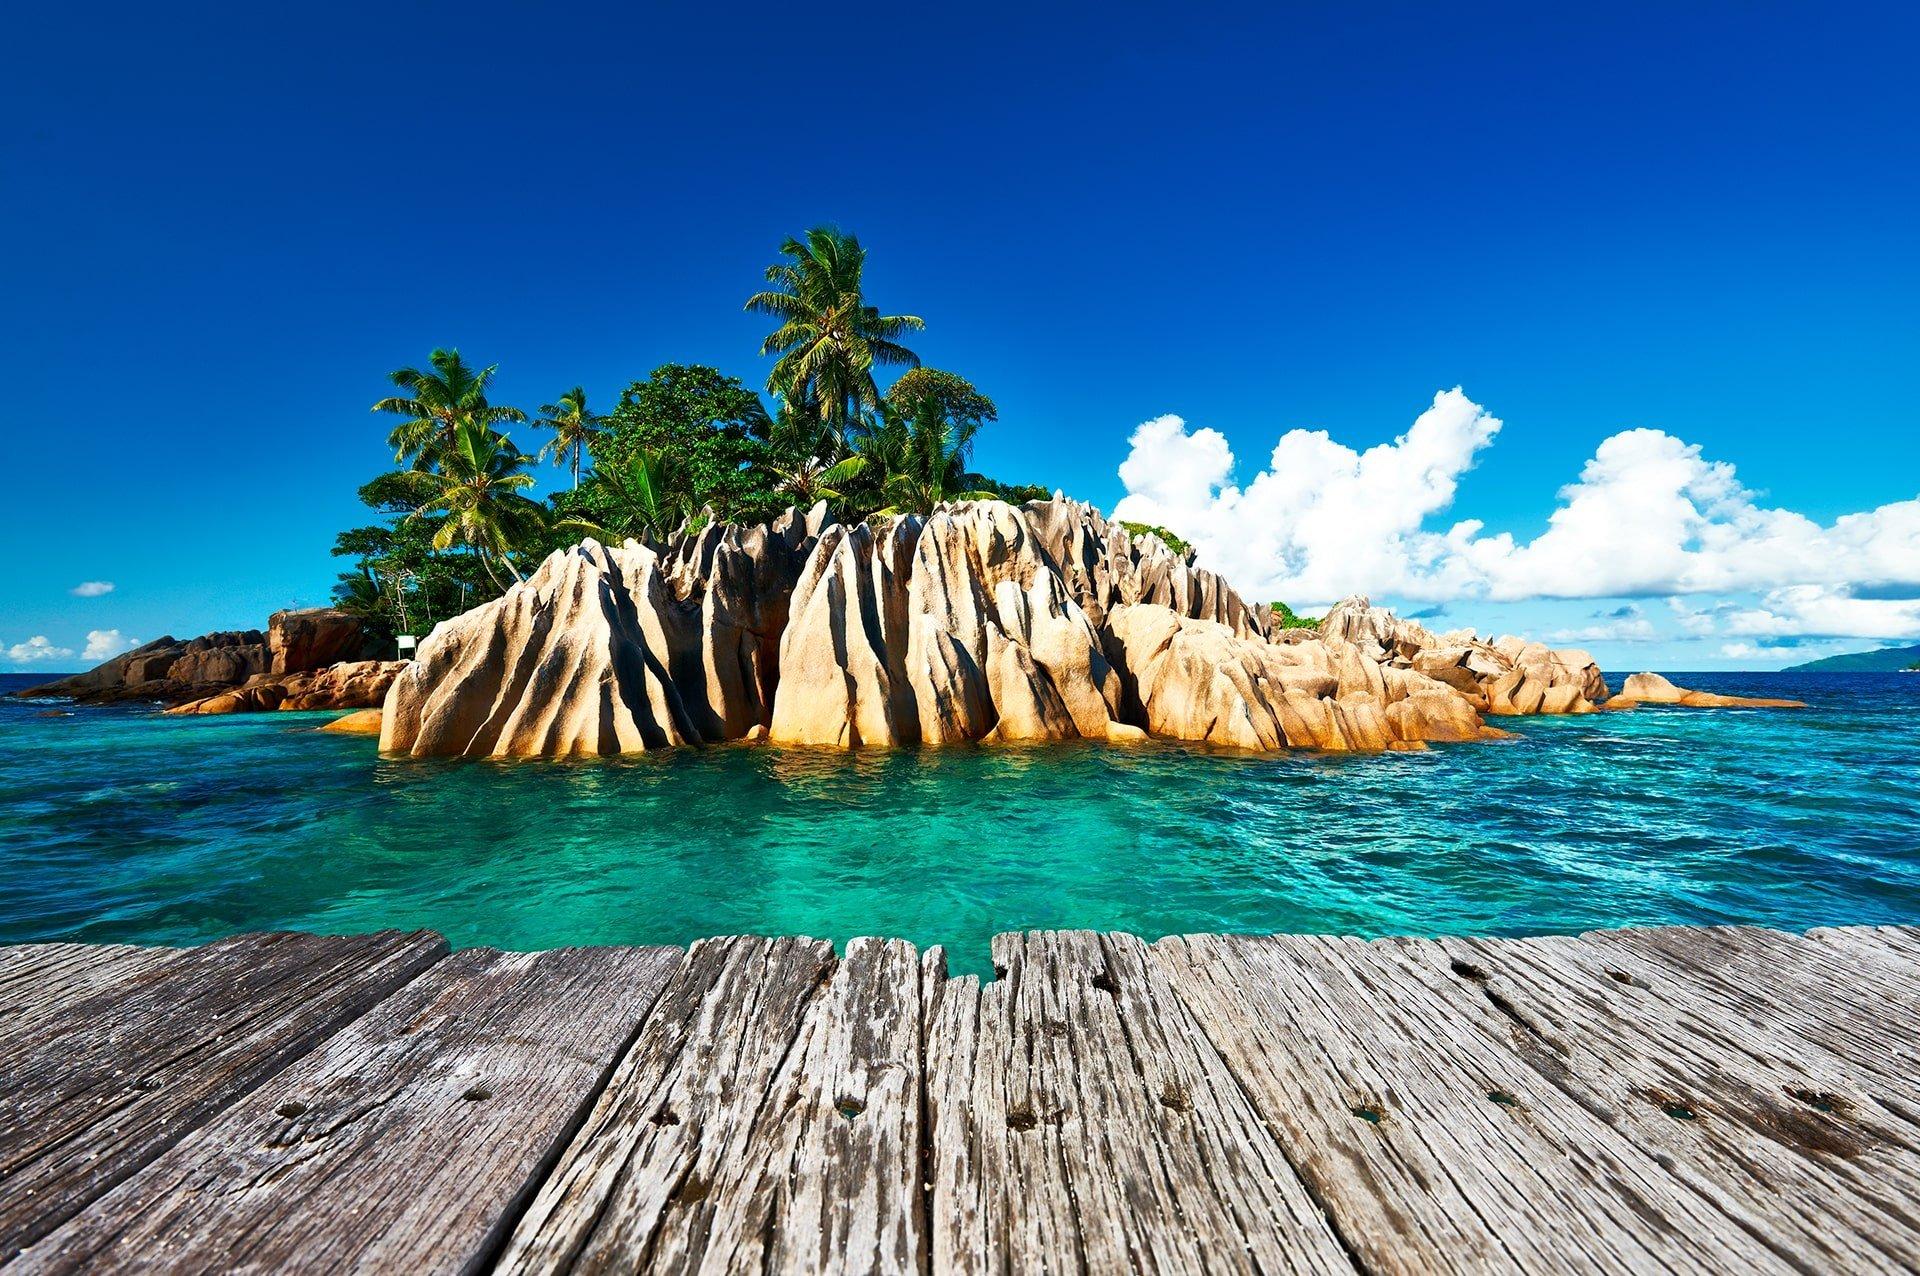 seychelles_iles-vanille_tropical-islannd